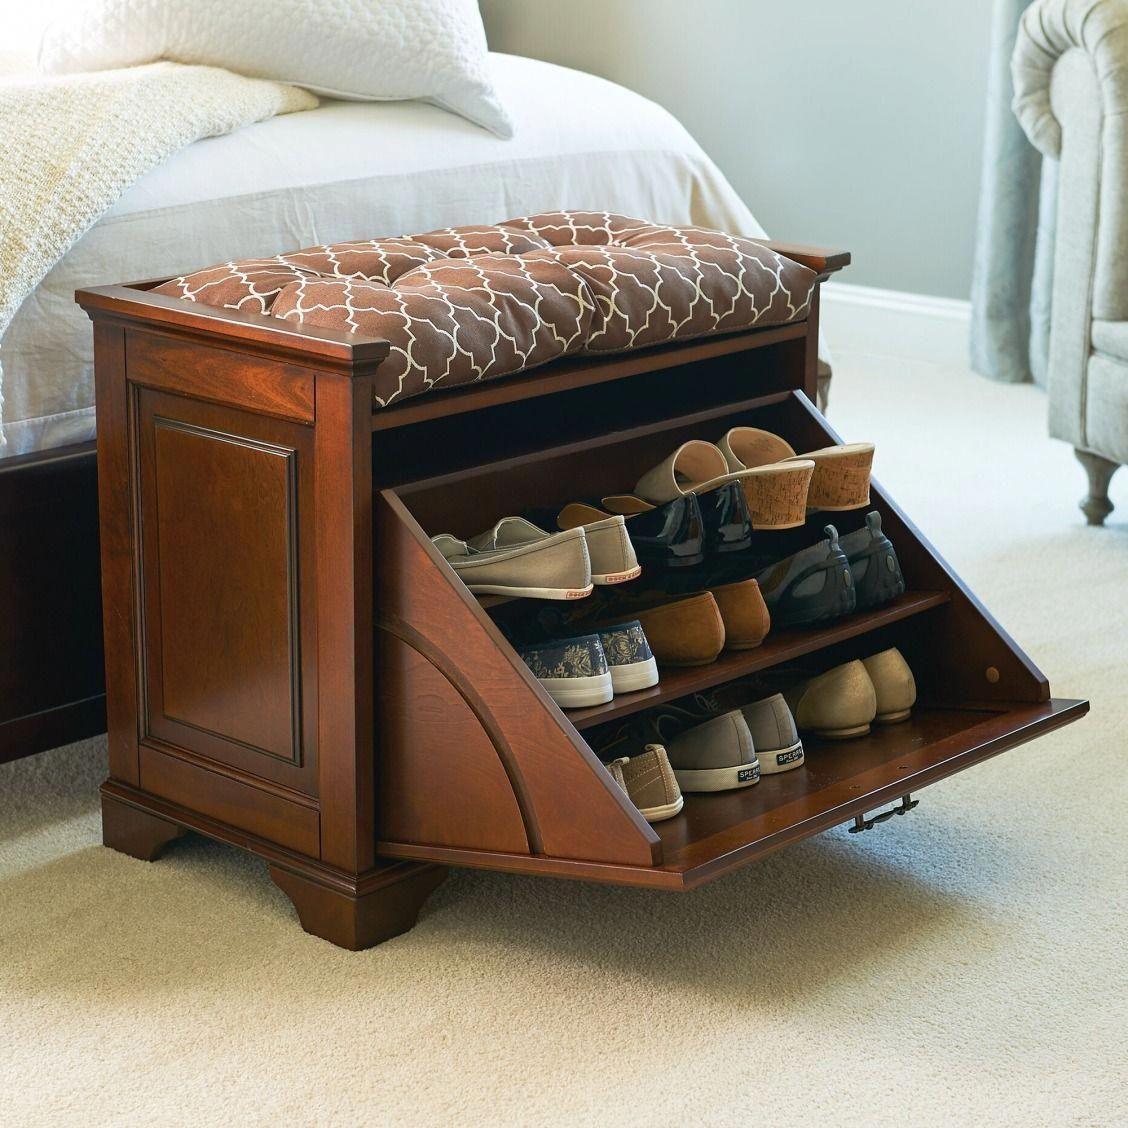 Universitat Kurse In Handwerk Und Mobeldesign Mobeldesign Furniture Multipurpose Furniture